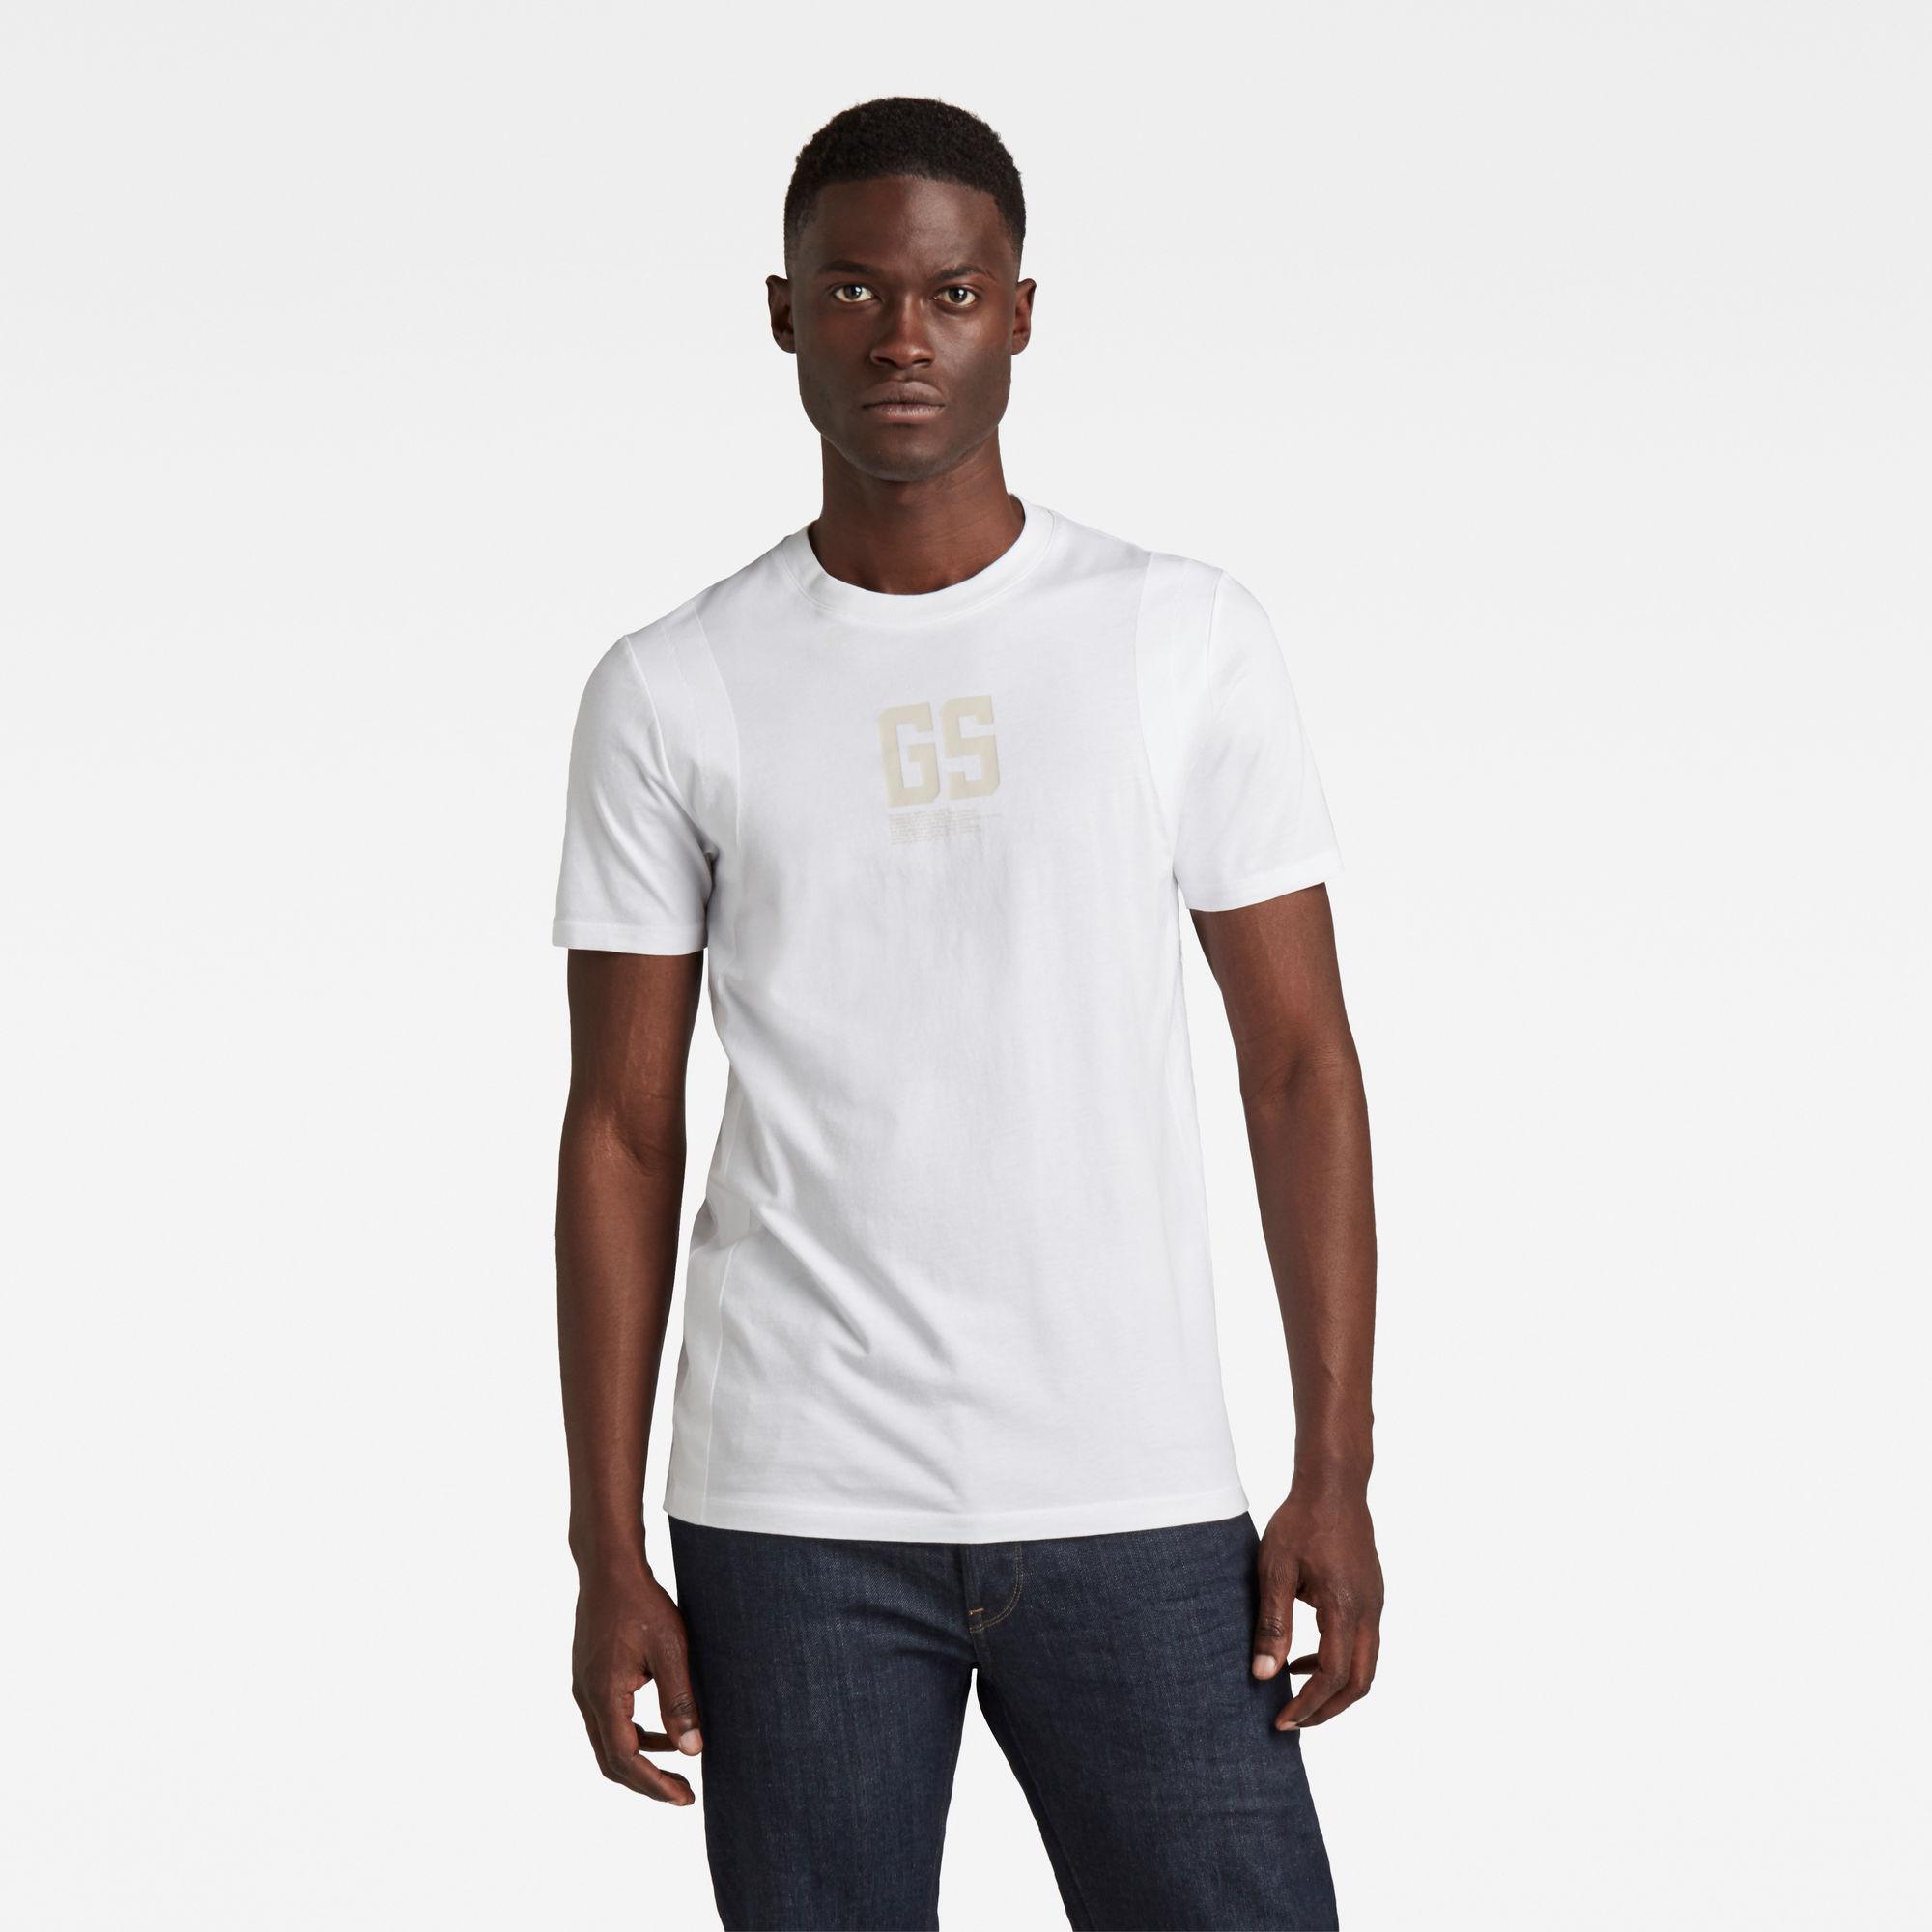 G-Star RAW Heren Stitch & Graphic Slim T-Shirt Wit